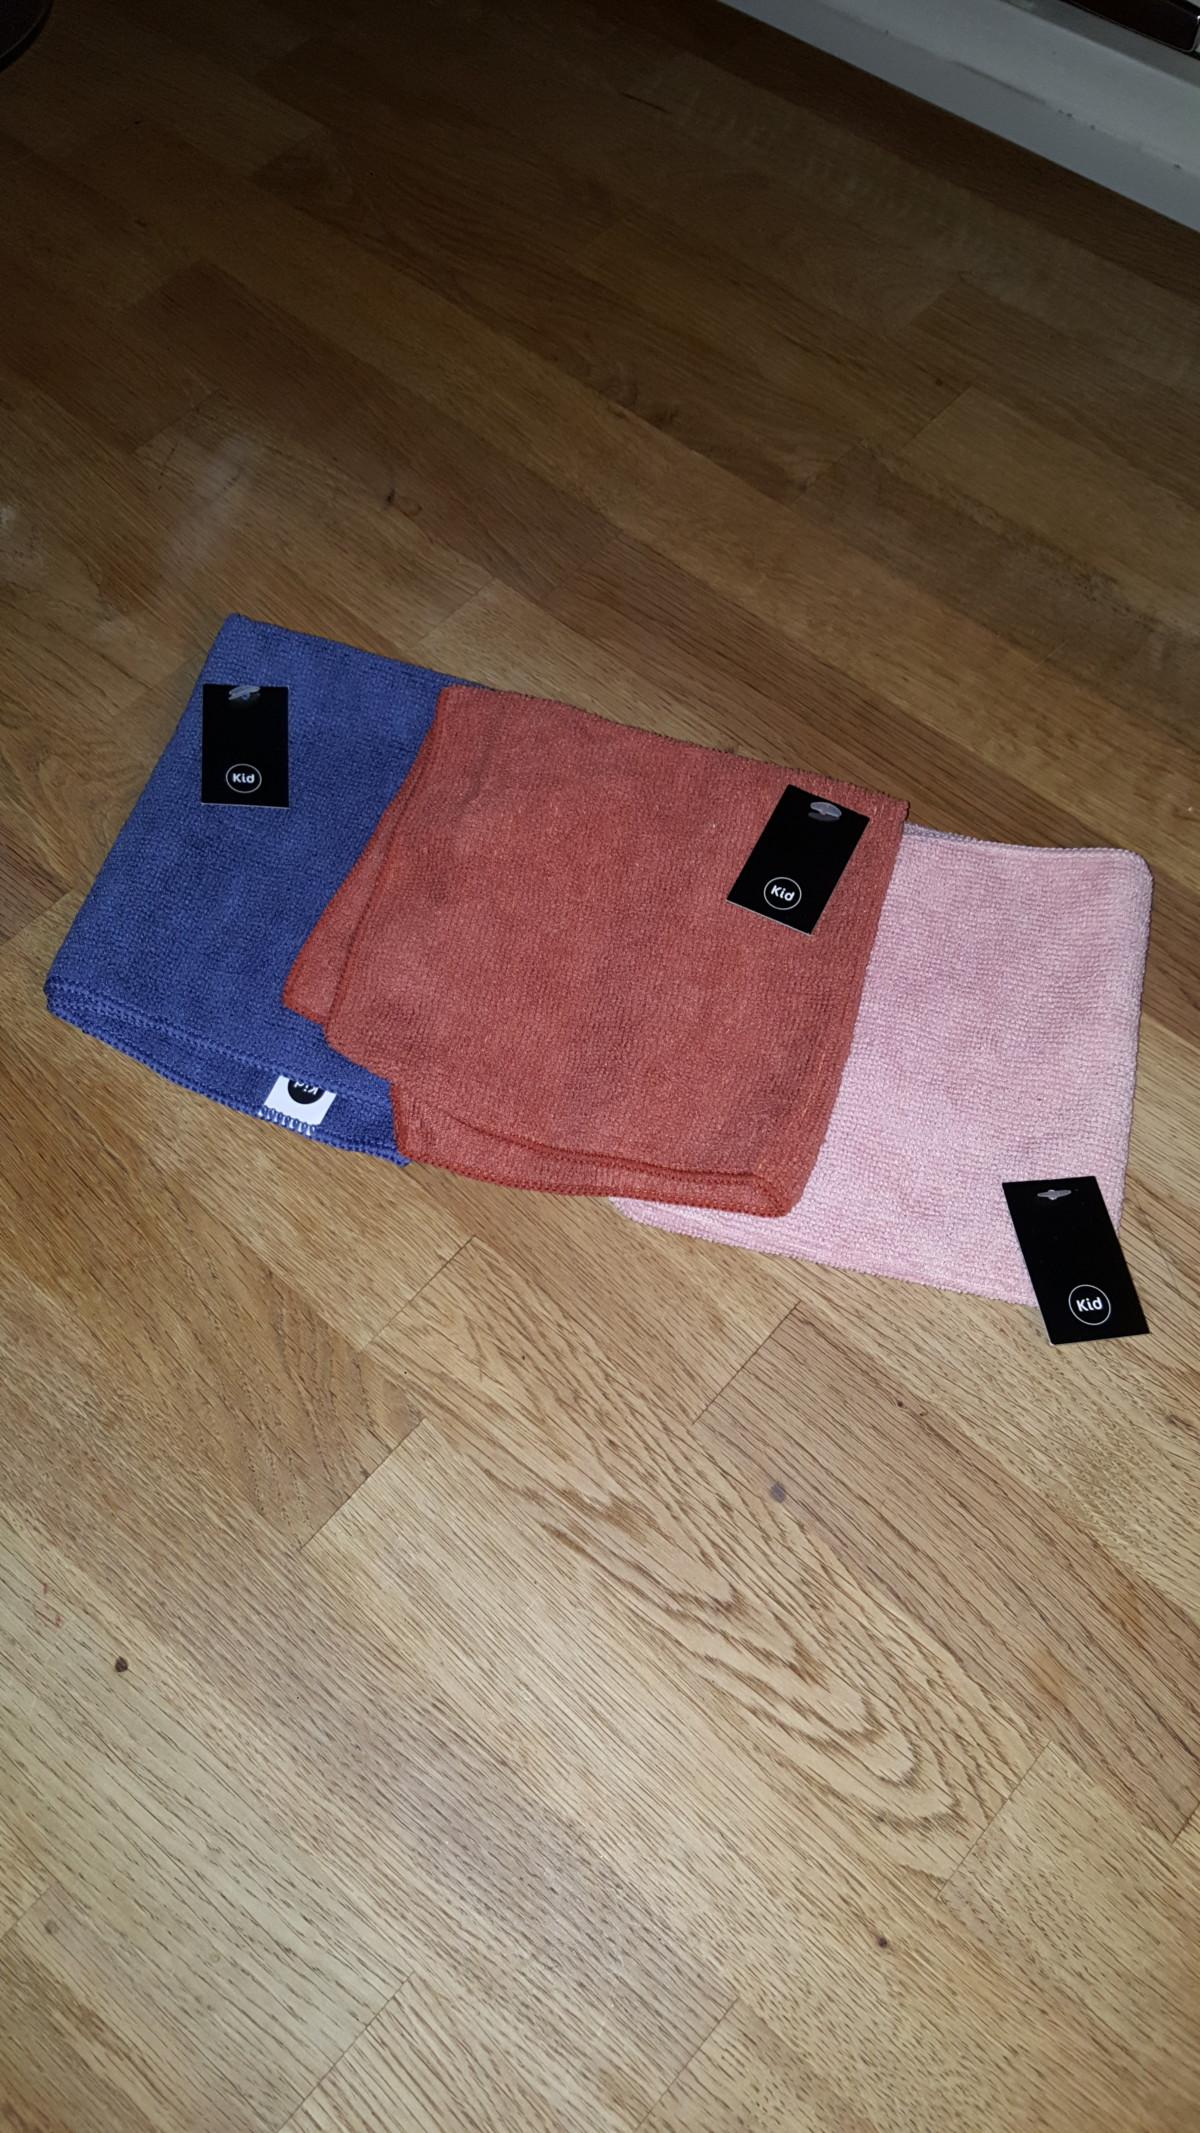 isalicious-blogger-blogg-mote-trend-stil-fashion-style-denim-jeans-mat-kid-shopping-innkjøp-newin-frø-konturcoolingnakkepute-konturpute-coolingkonturpute-nakkepute-coolingpute